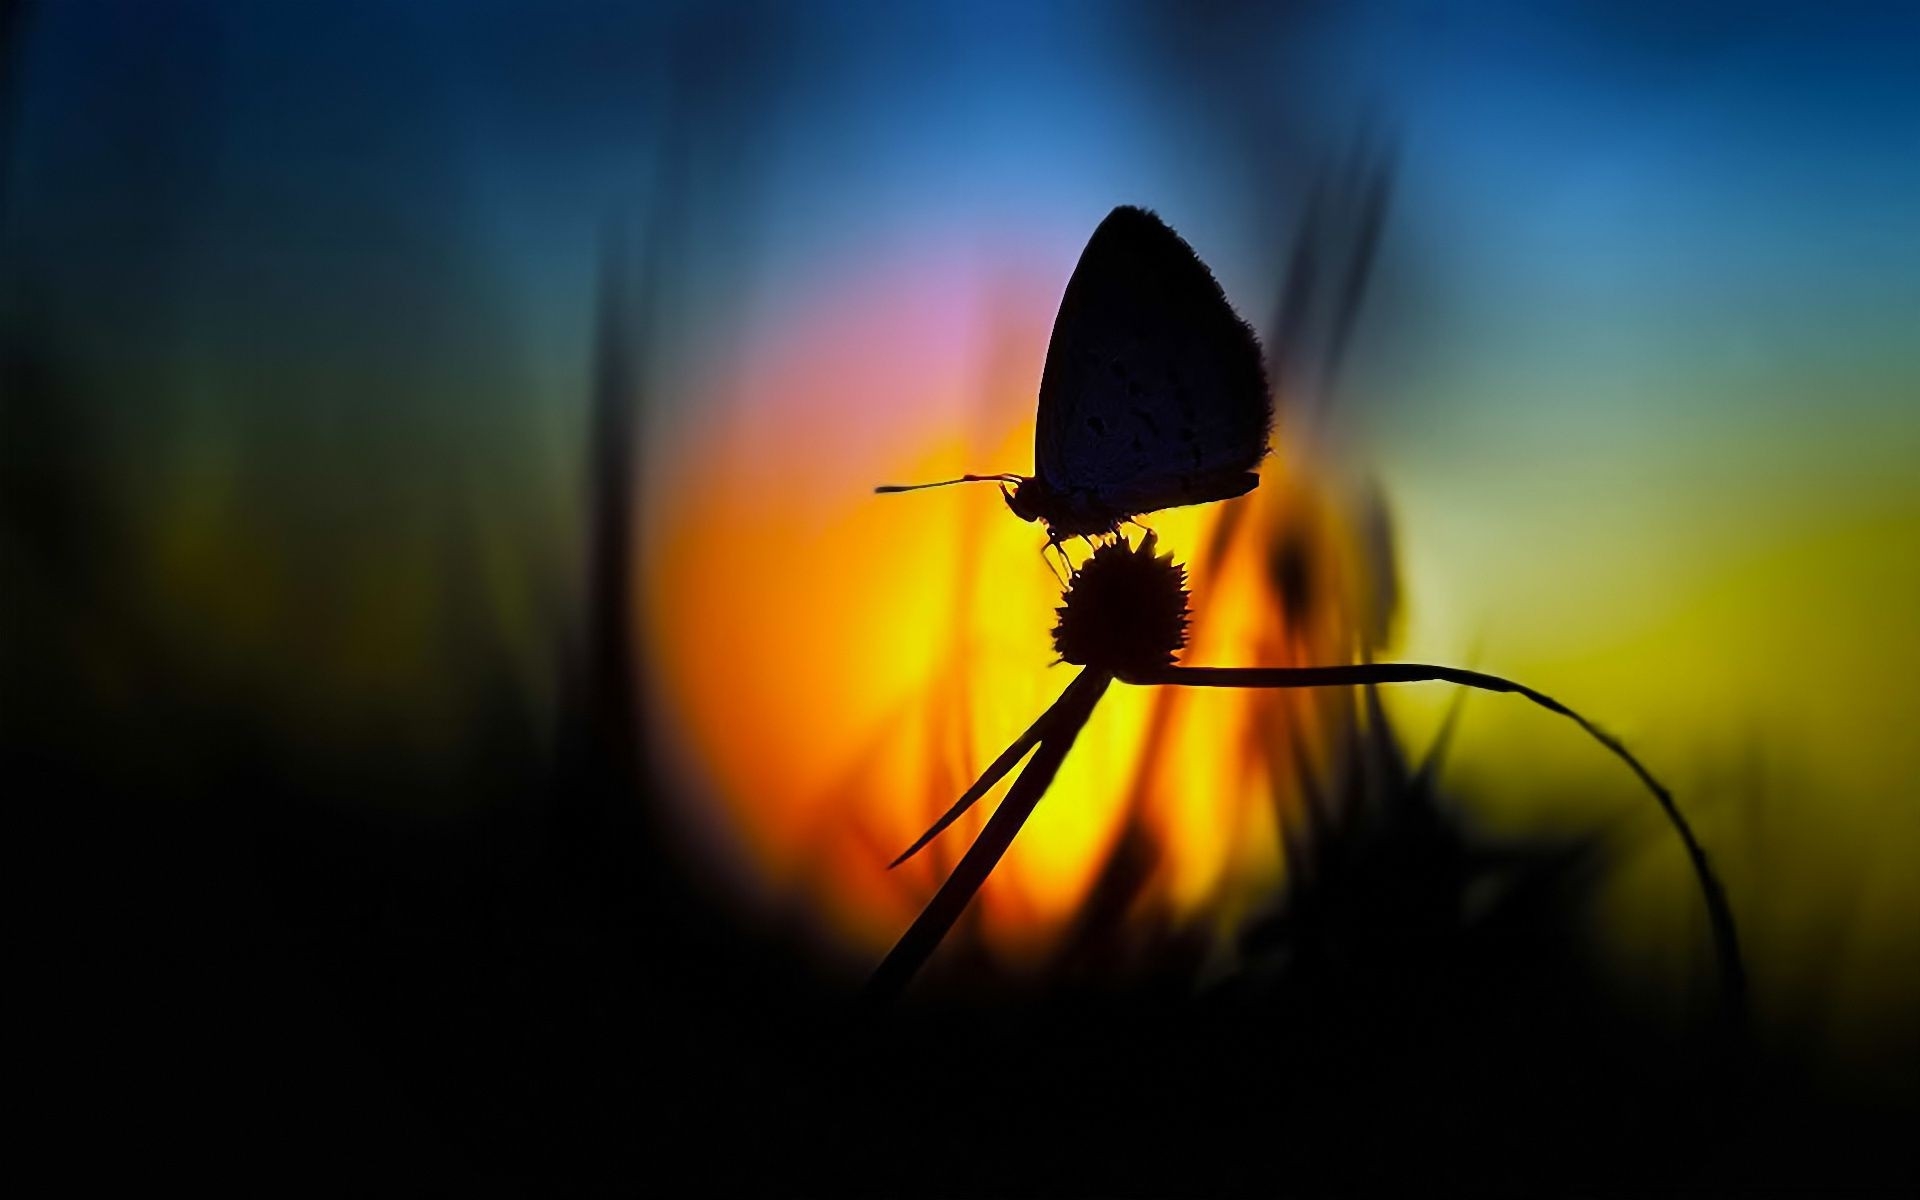 Микрофоном днем, картинки цветы на фоне заката